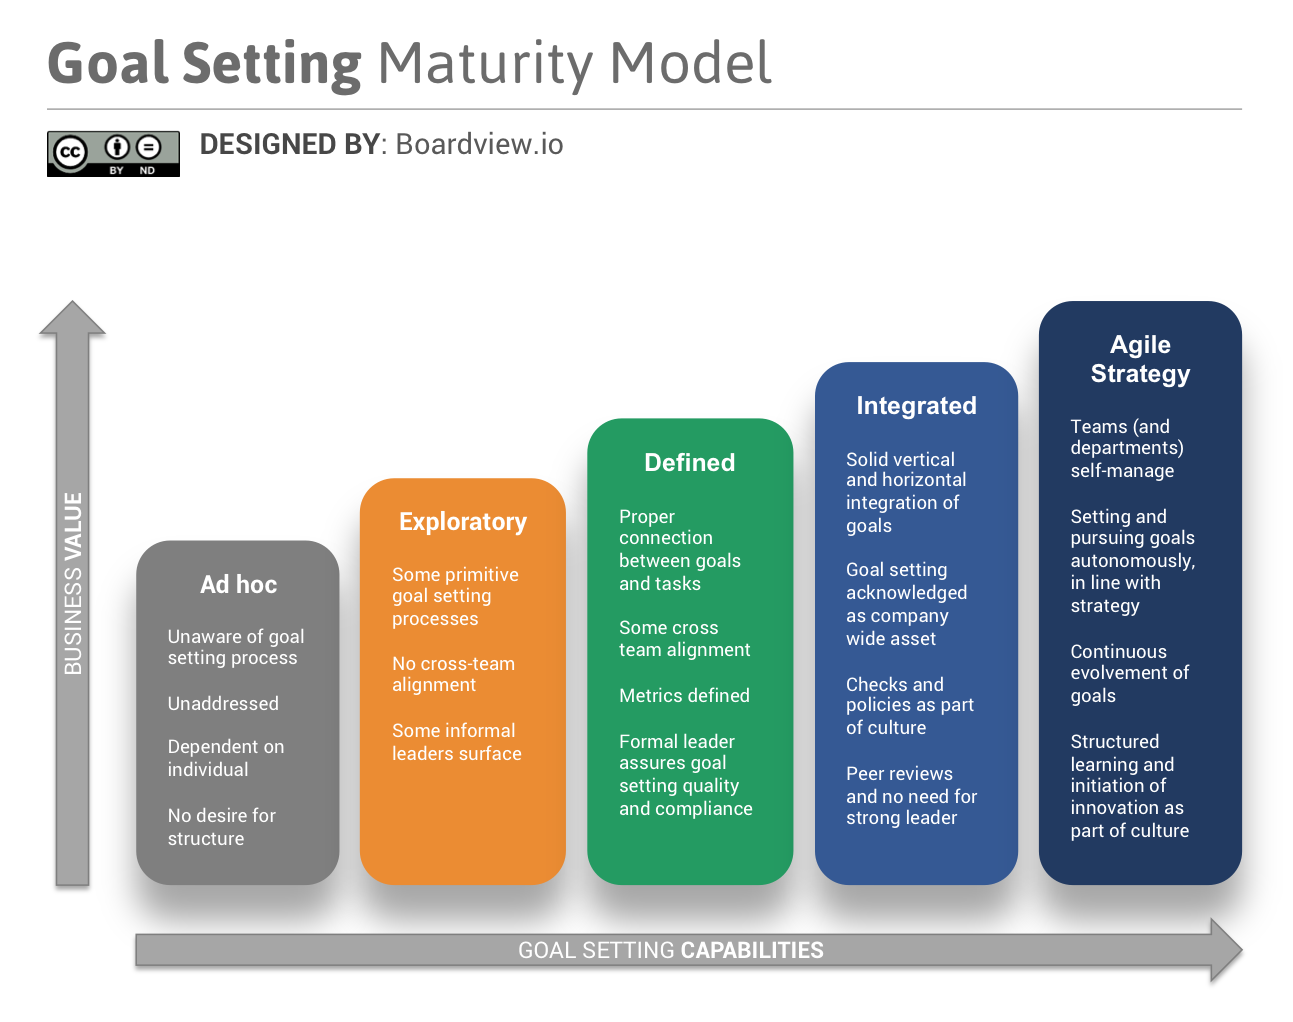 goal-setting-maturity-model-boardview